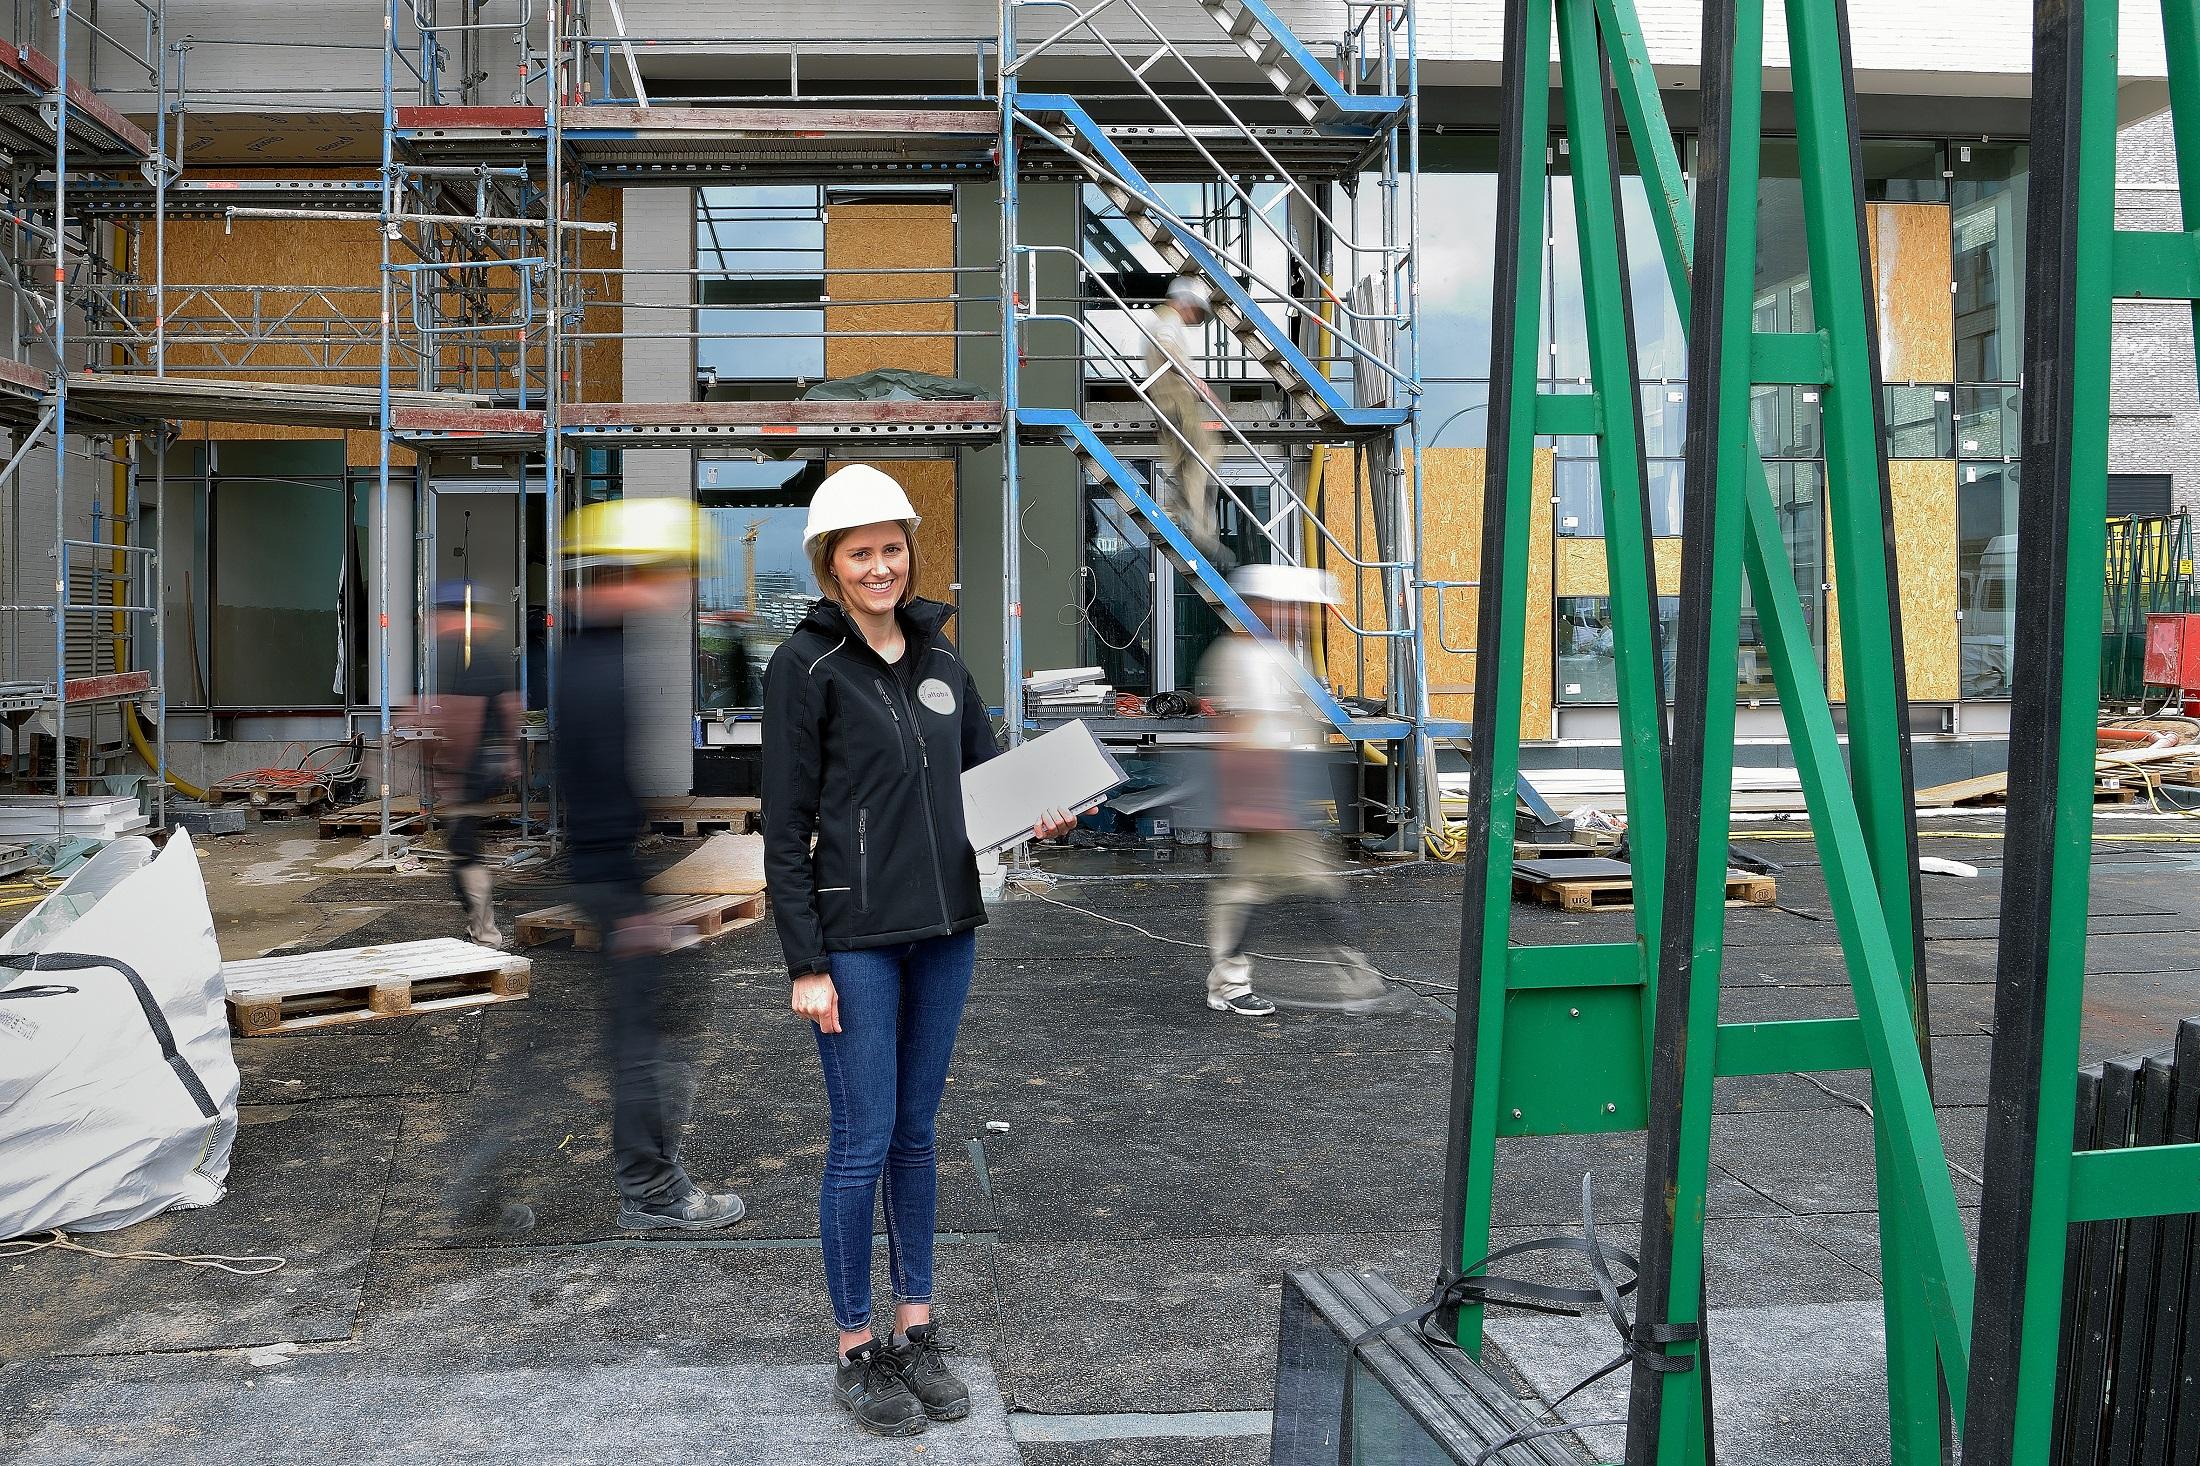 Alles in Bewegung: Blick auf die Baustelle am Baakenhafen (© Kristina Wedekind)